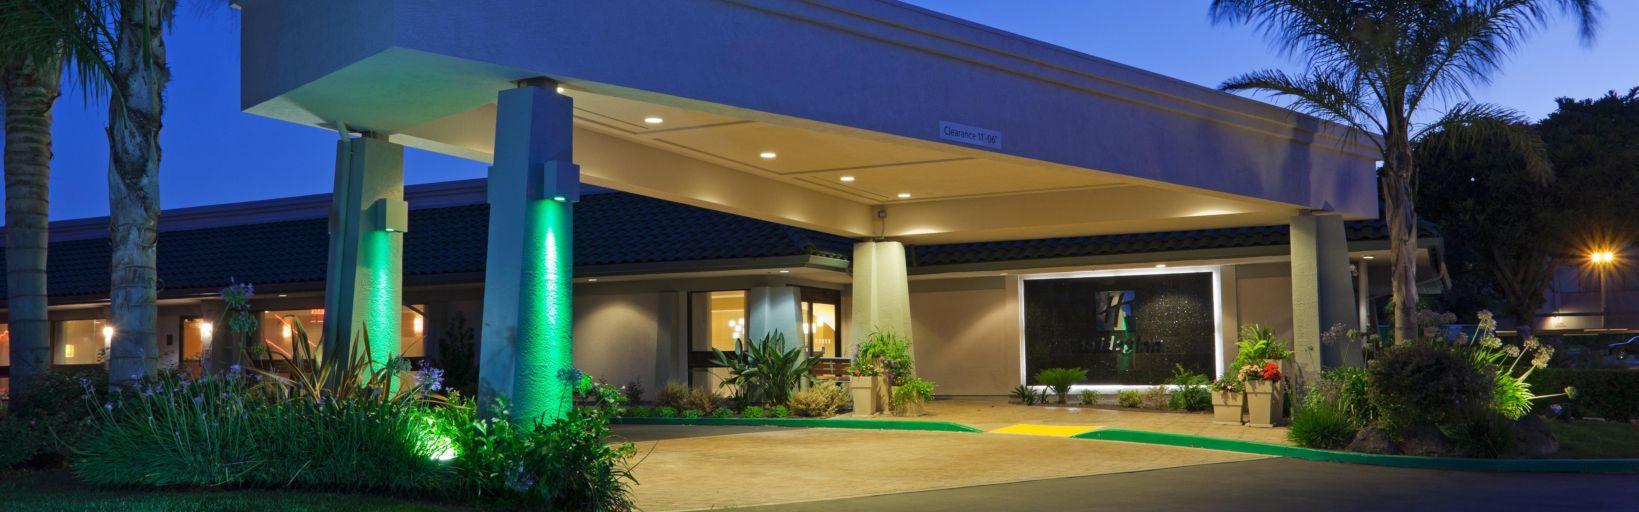 Image result for Holiday Inn Dublin-Pleasanton